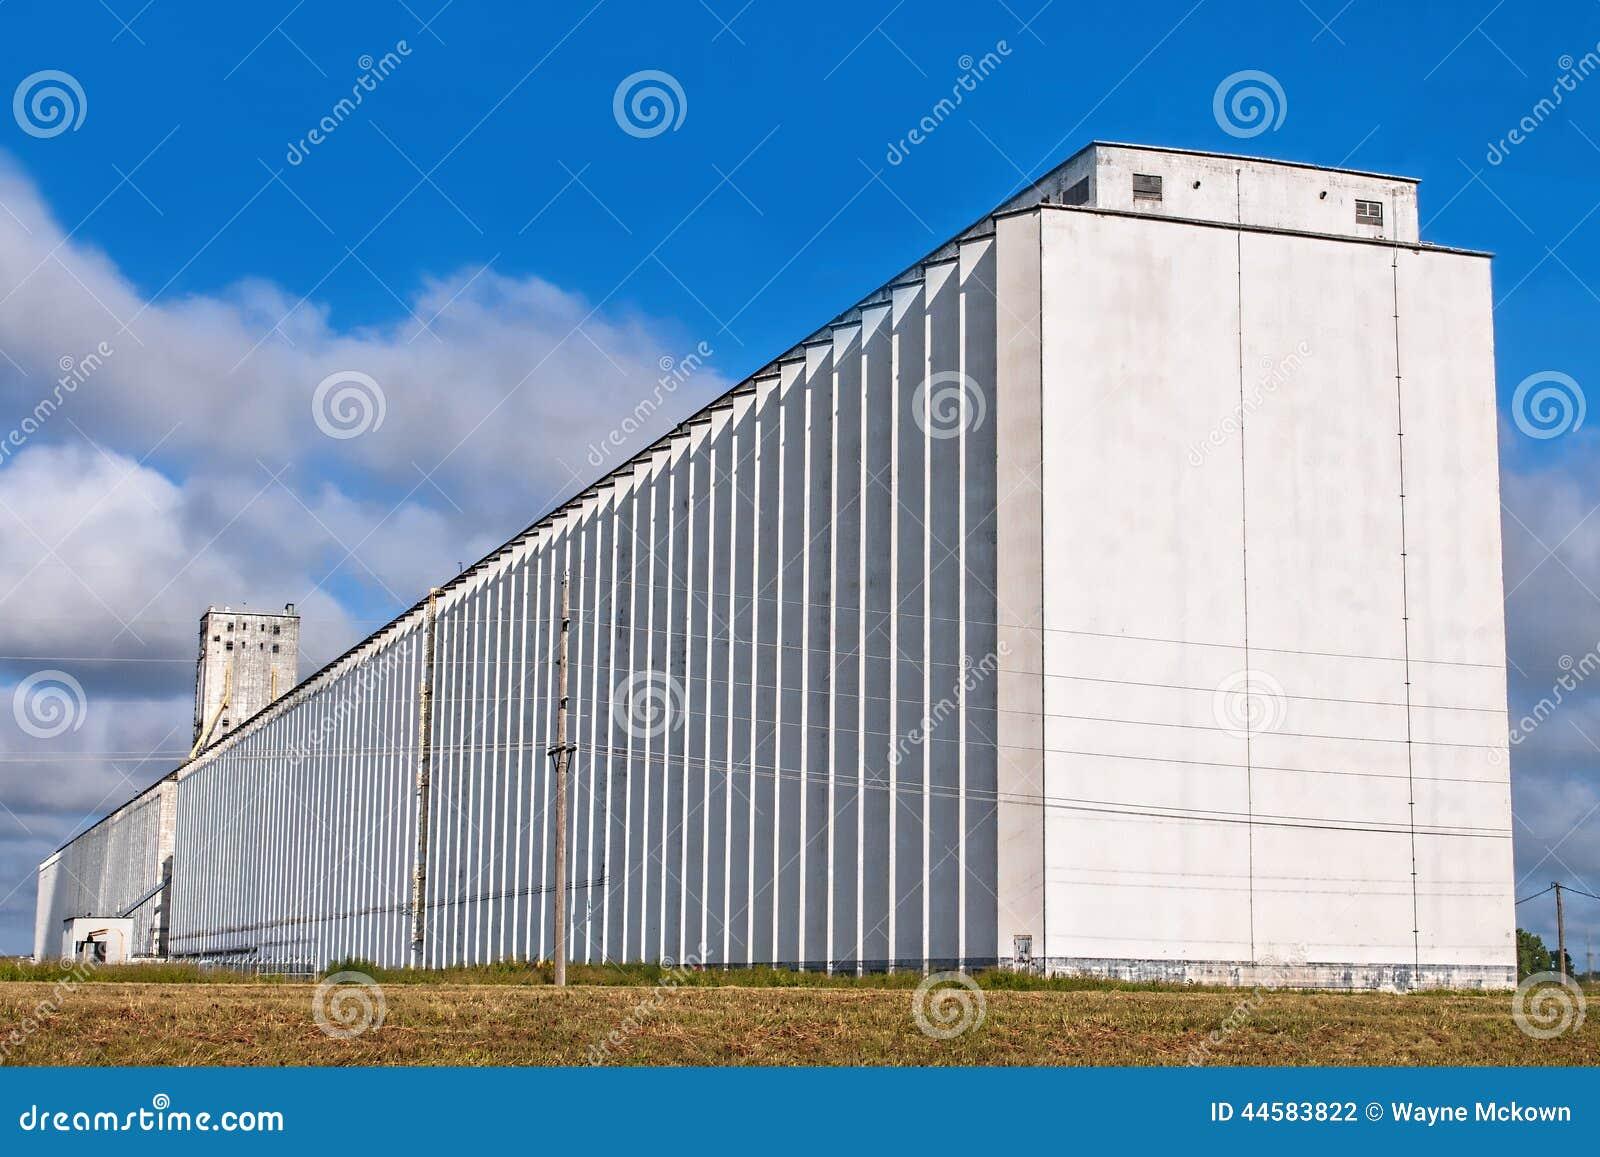 grain elevator business plan